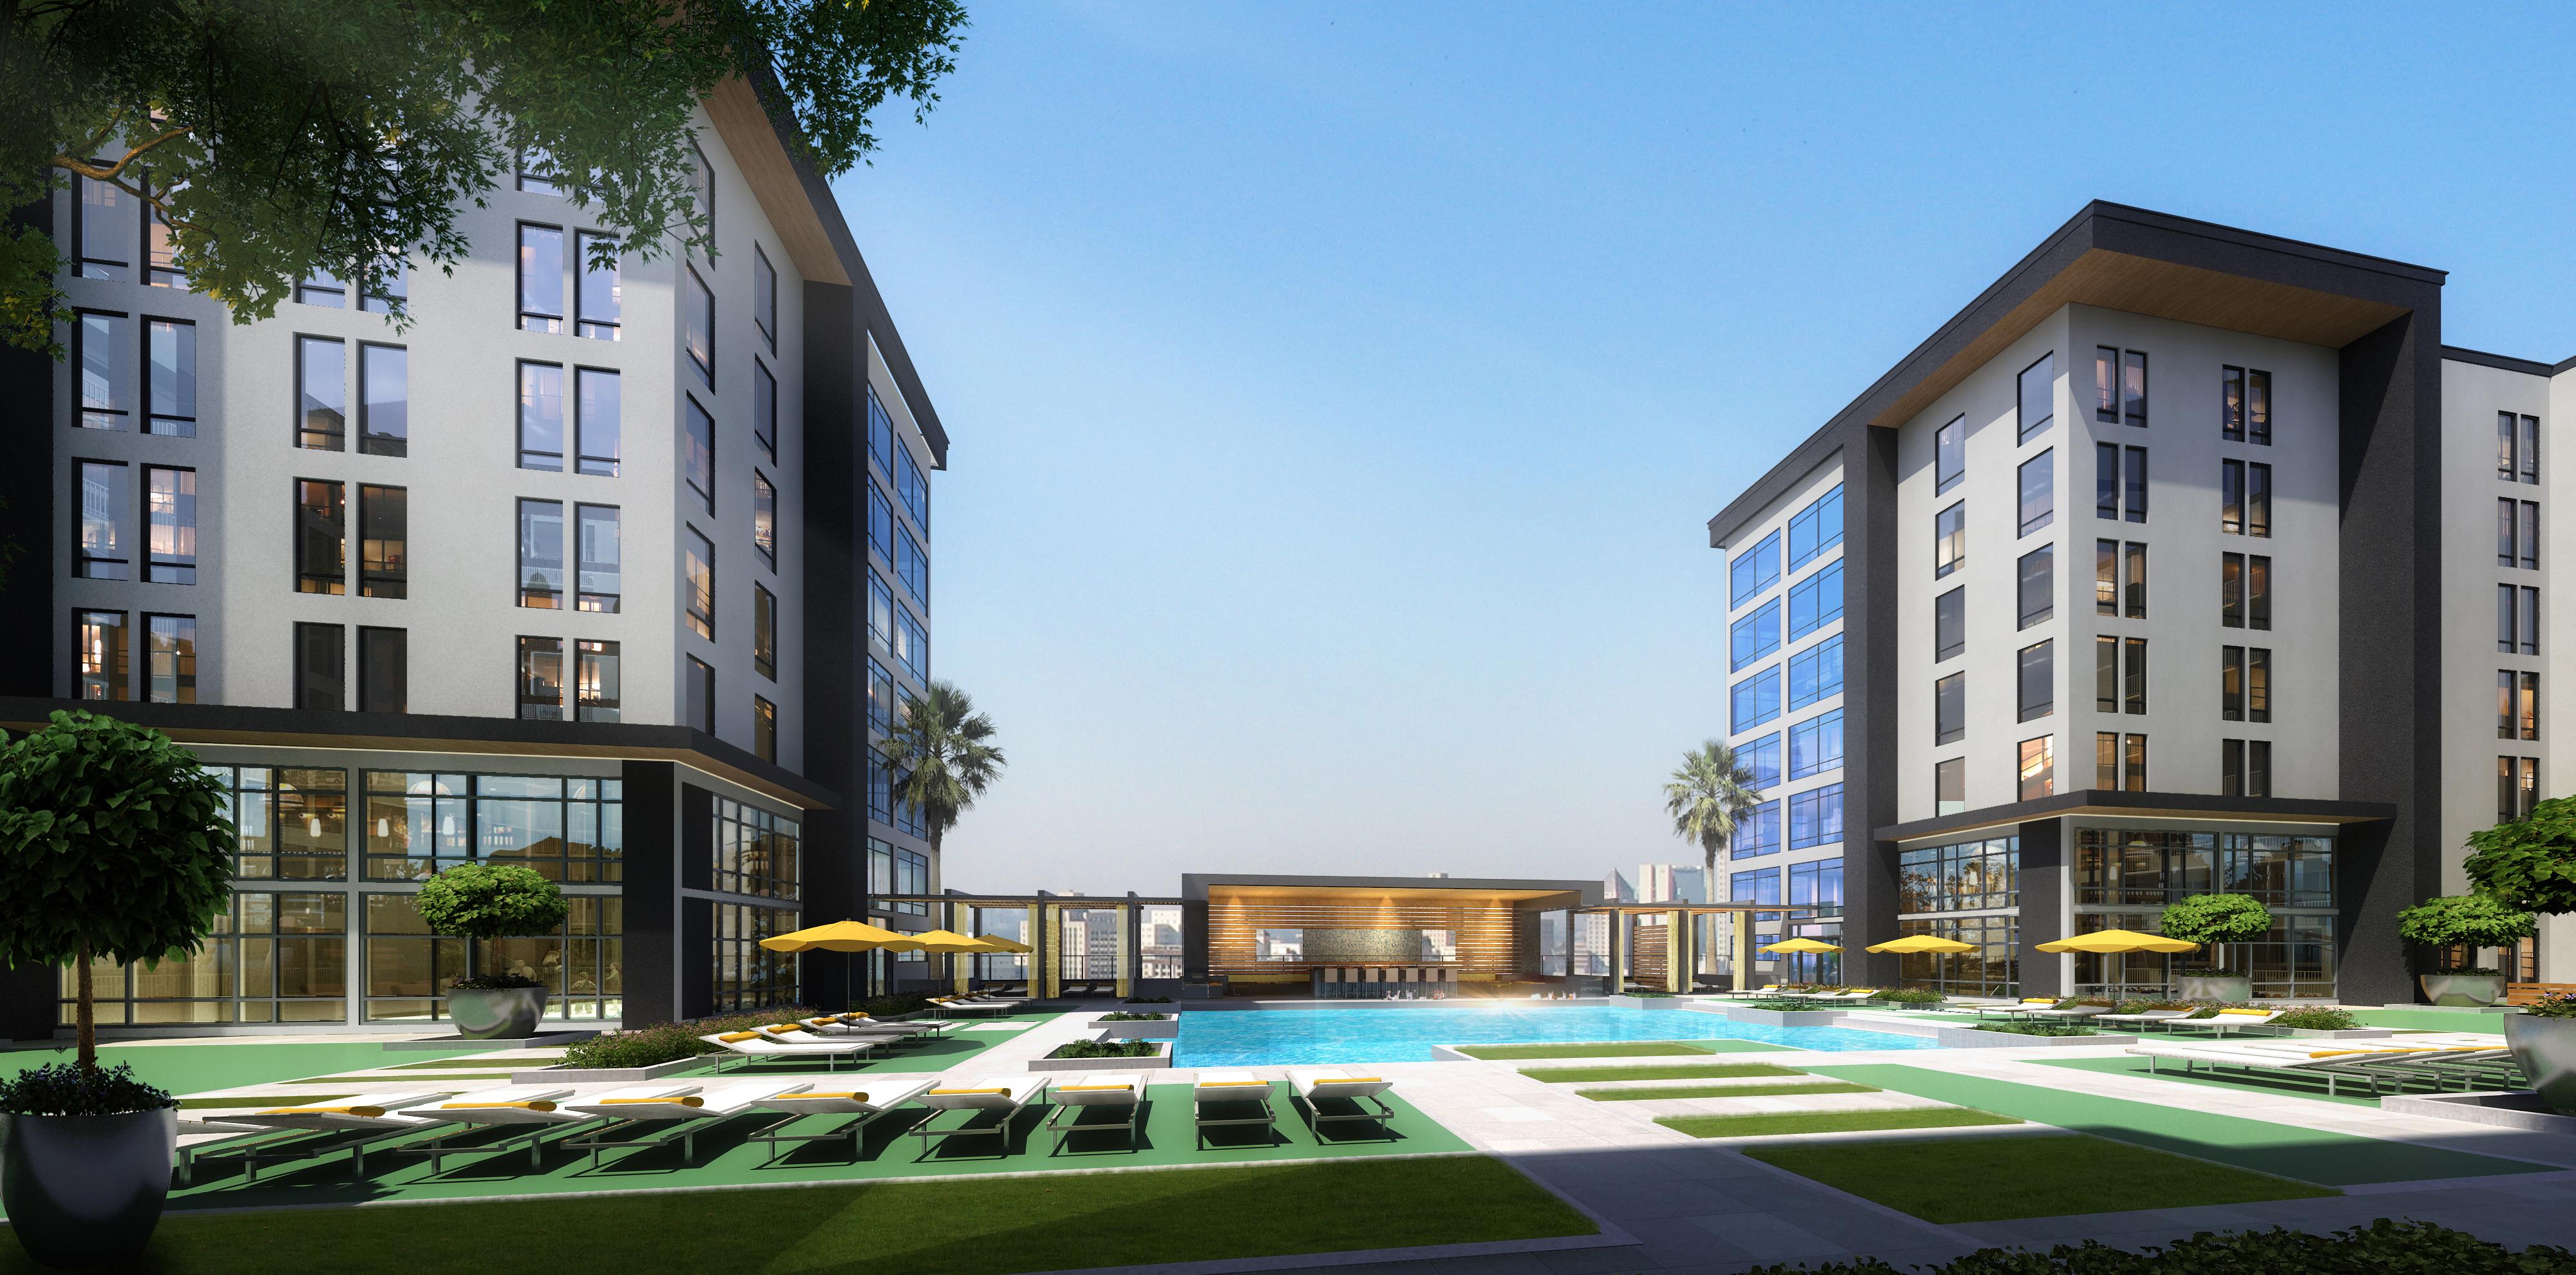 camden-lake-eola-apartments-orlando-florida-seventh-floor-pool.jpg